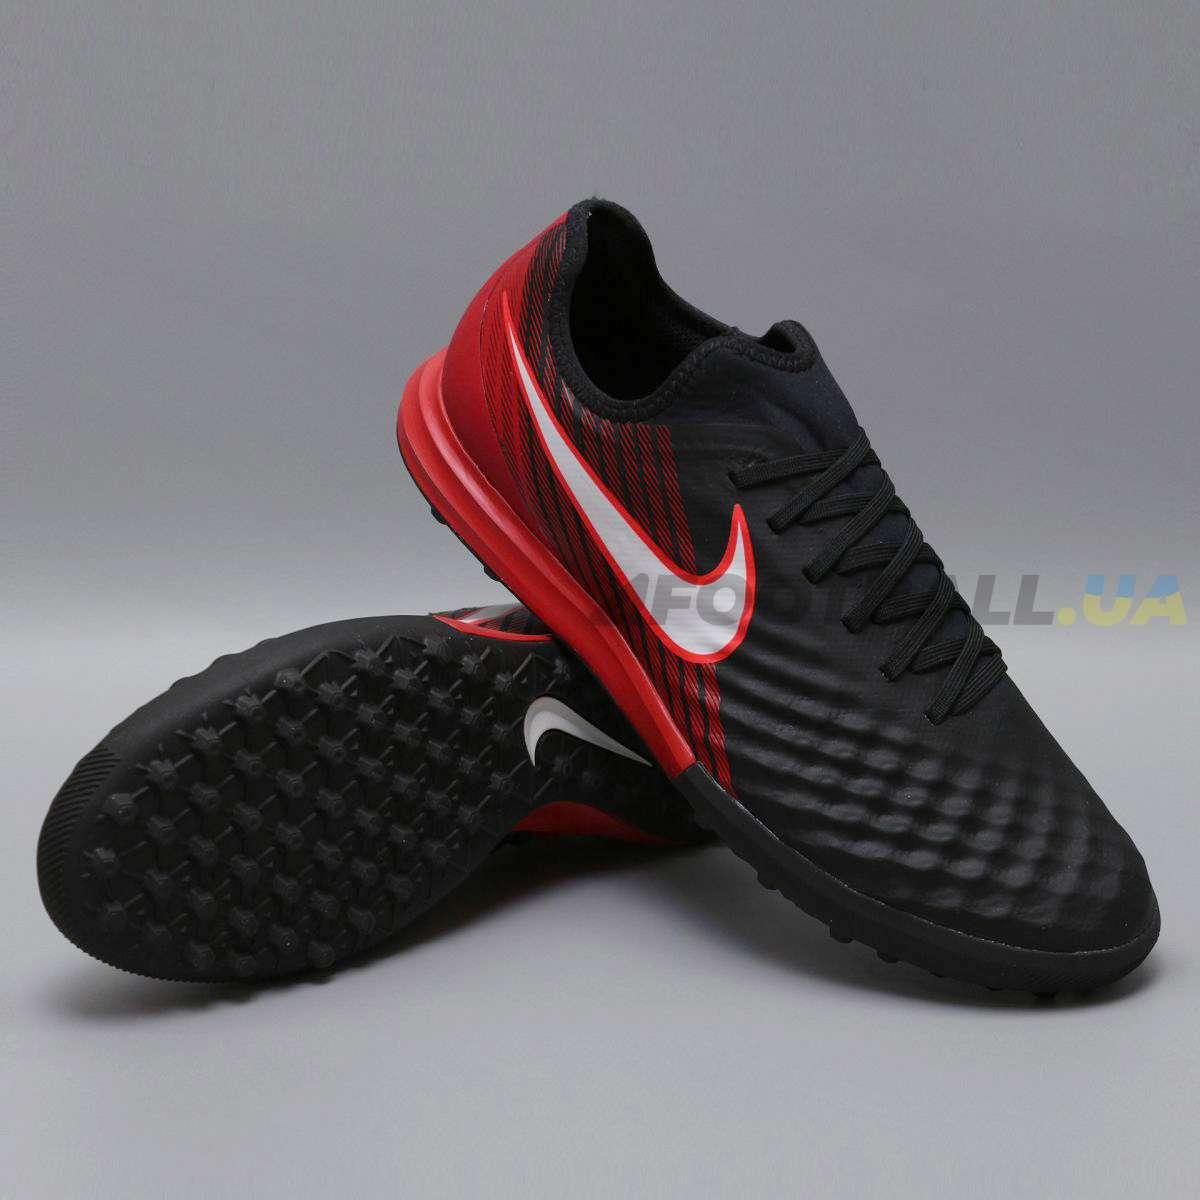 abe96e7e Сороконожки NIKE MAGISTAX FINALE II TF 844446-061 black-red купить ...